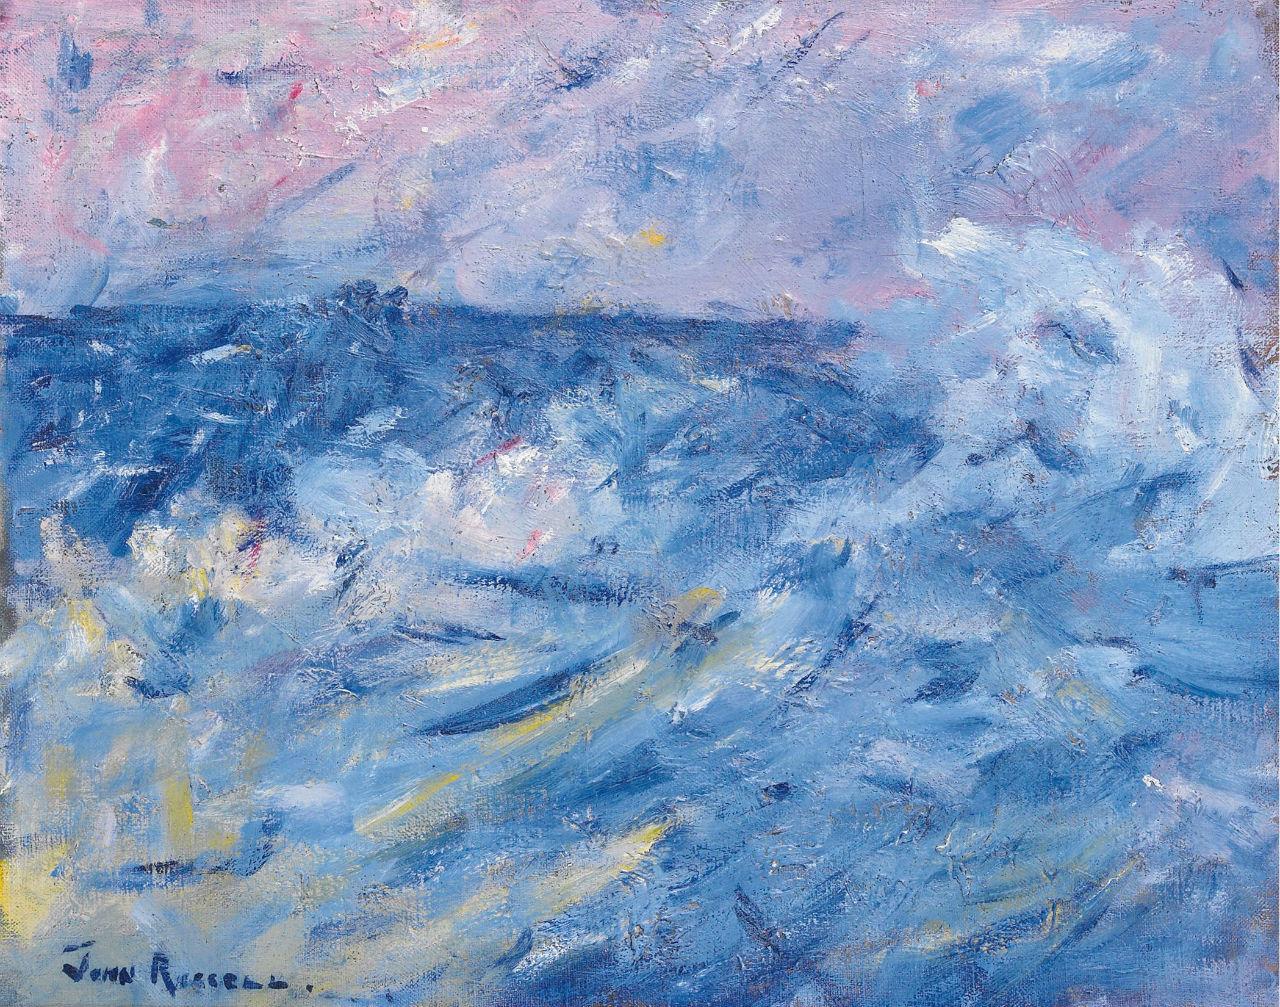 7-Живопись_Джон-Питер-Рассел_Stormy-Sky-and-Sea-Belle-Ile-off-Brittany-1890.jpg